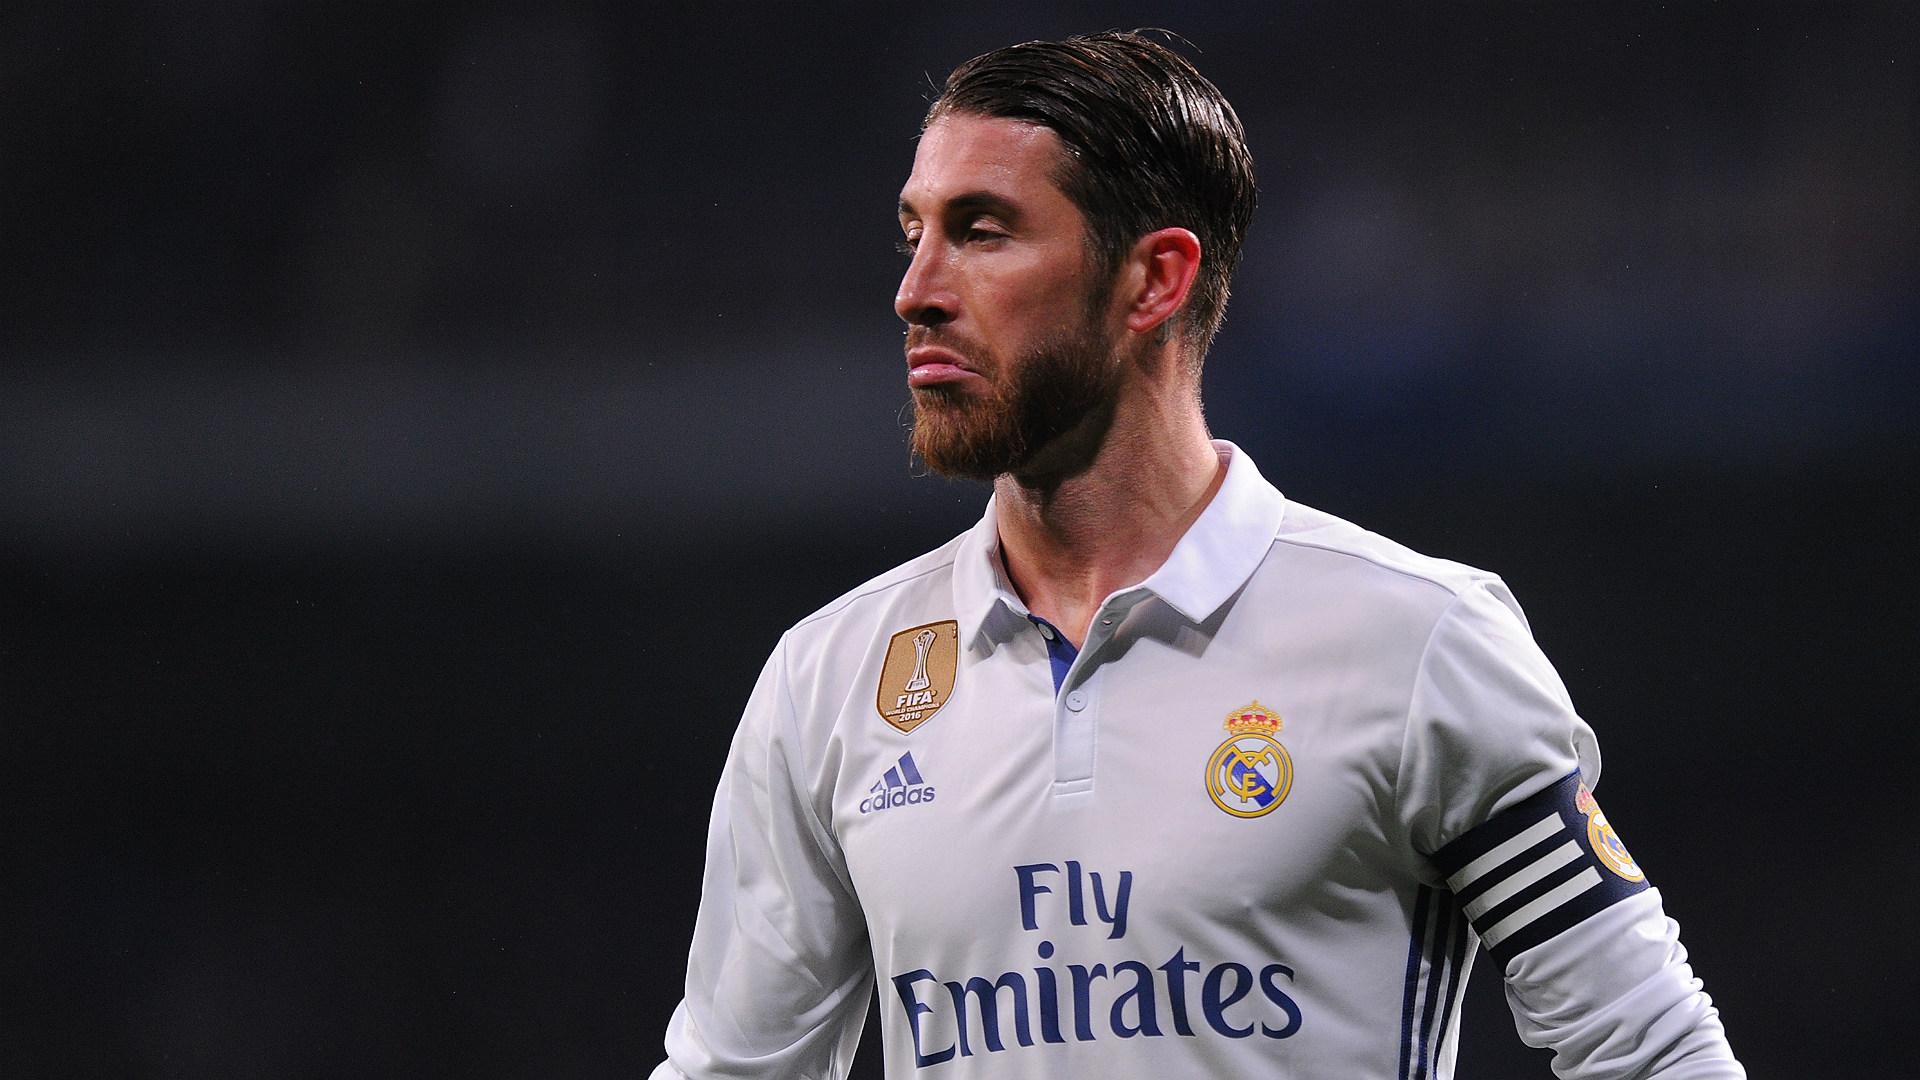 Marcelo La Liga title in Real Madrid s hands